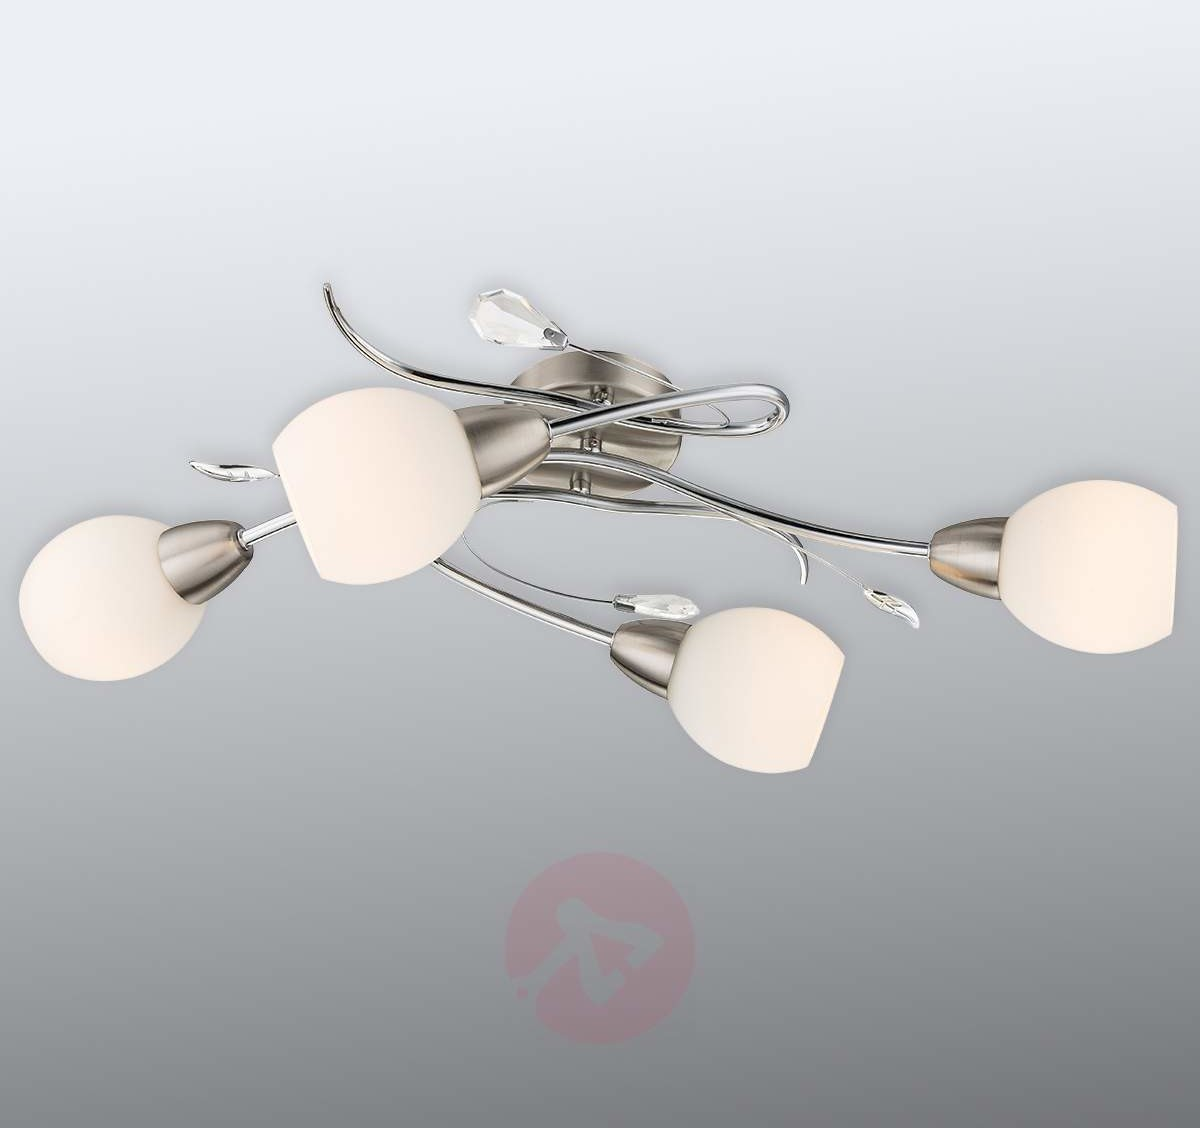 Globo Lighting Lilly lampa sufitowa Nikiel matowy, Chrom, 4-punktowe 60209-4